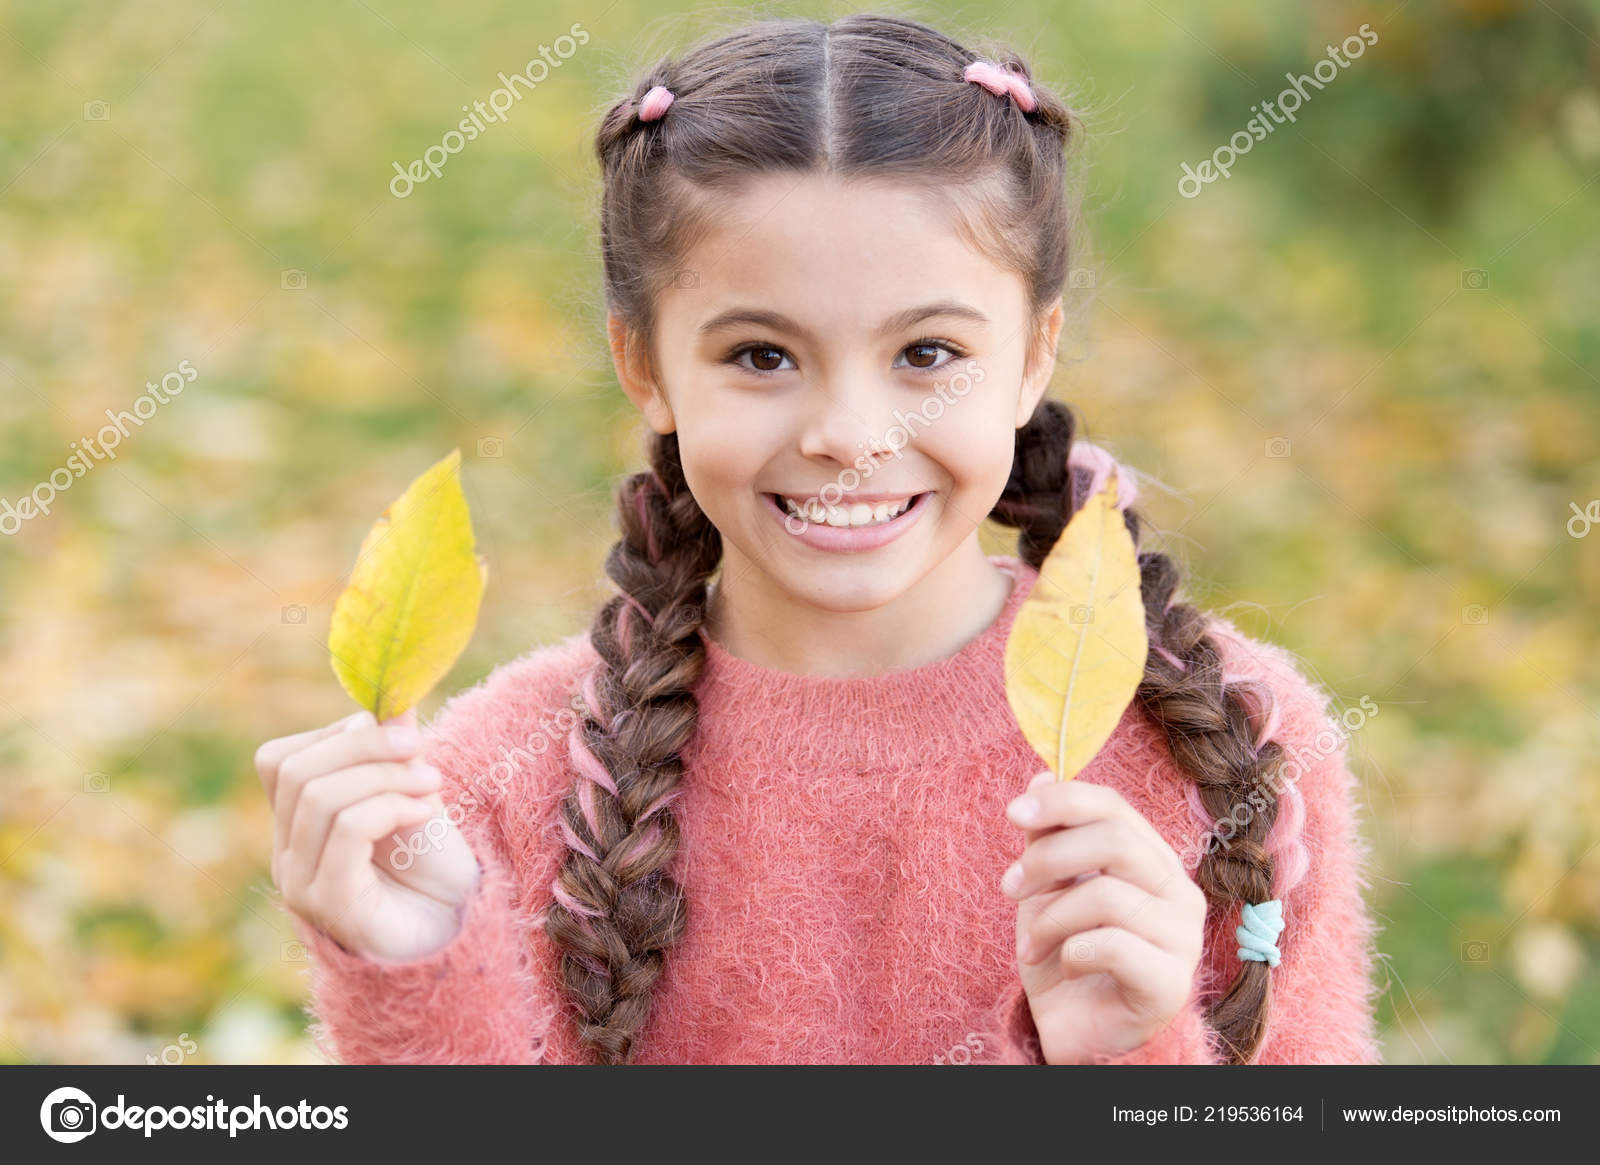 ea7bbc30106 depositphotos_219536164-stock-photo-small-child-with-autumn-leaves.jpg